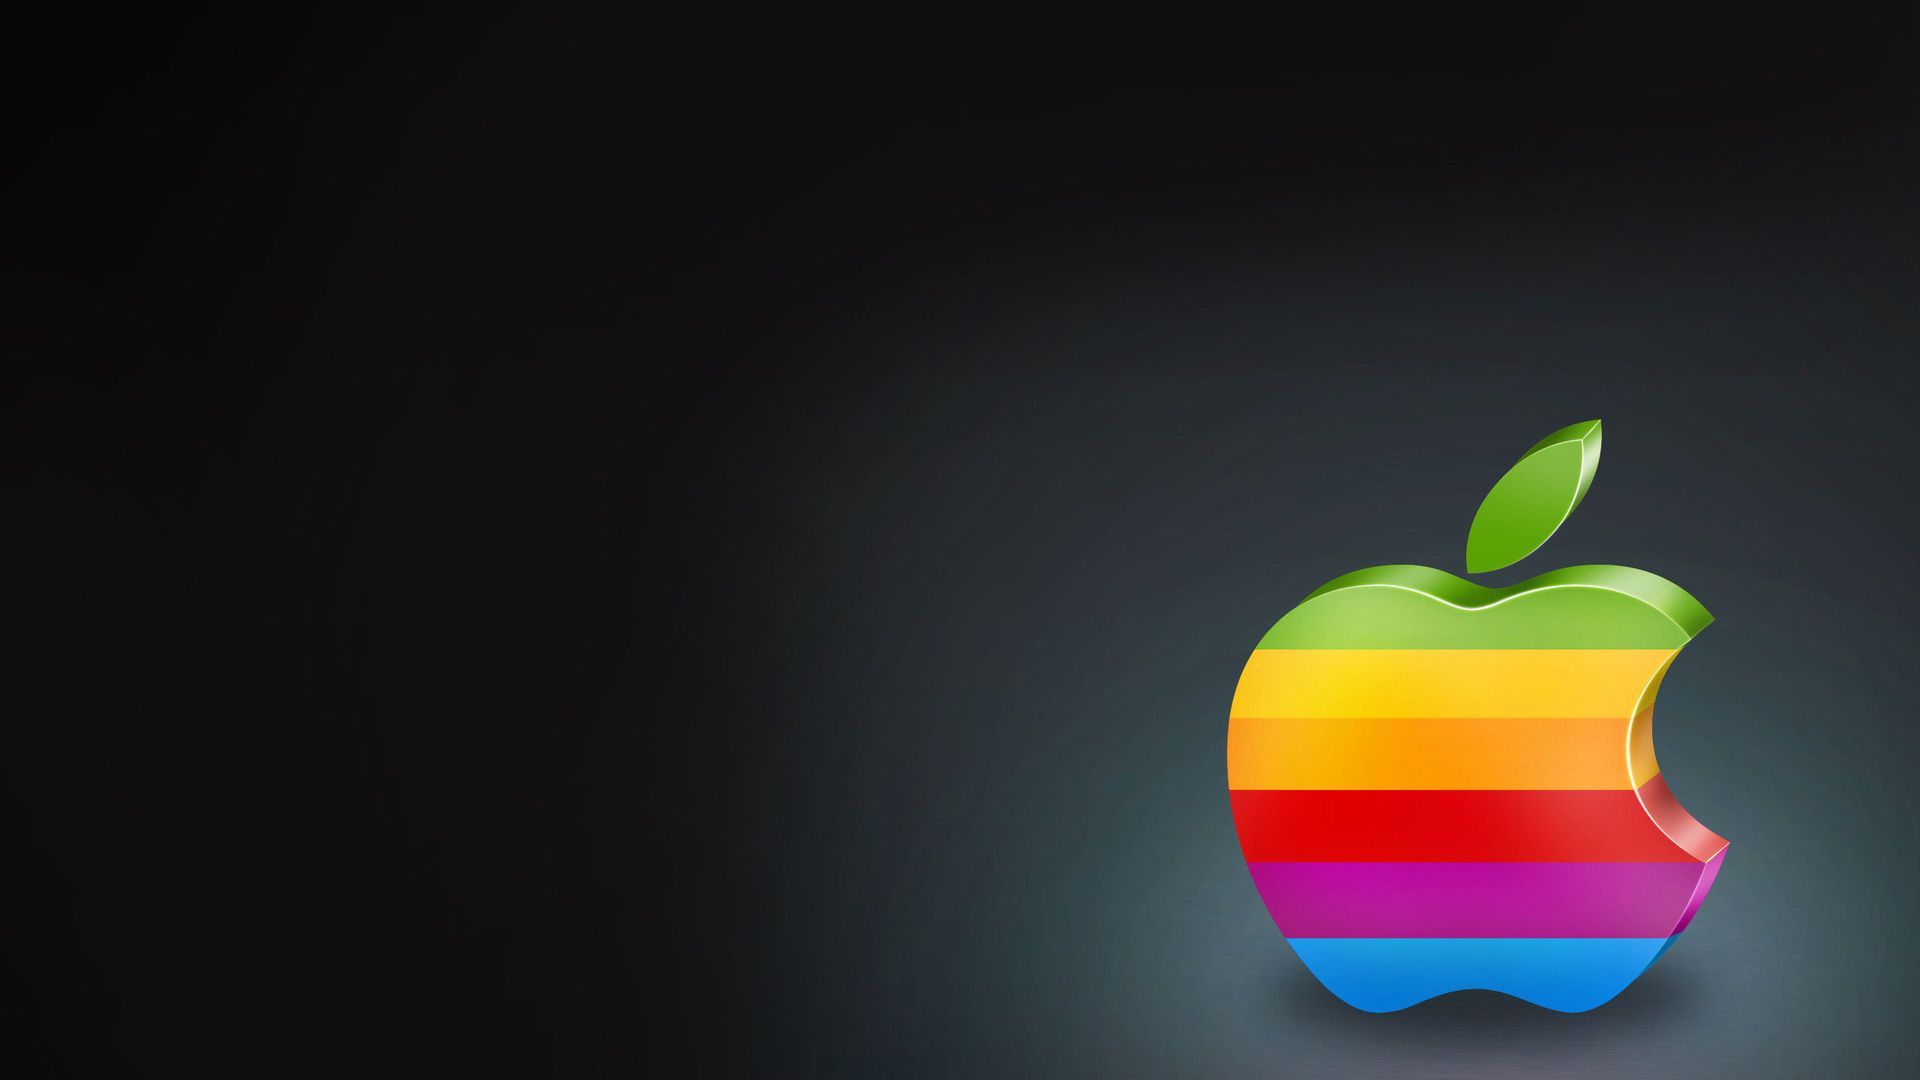 Apple Ipad desktop background hd